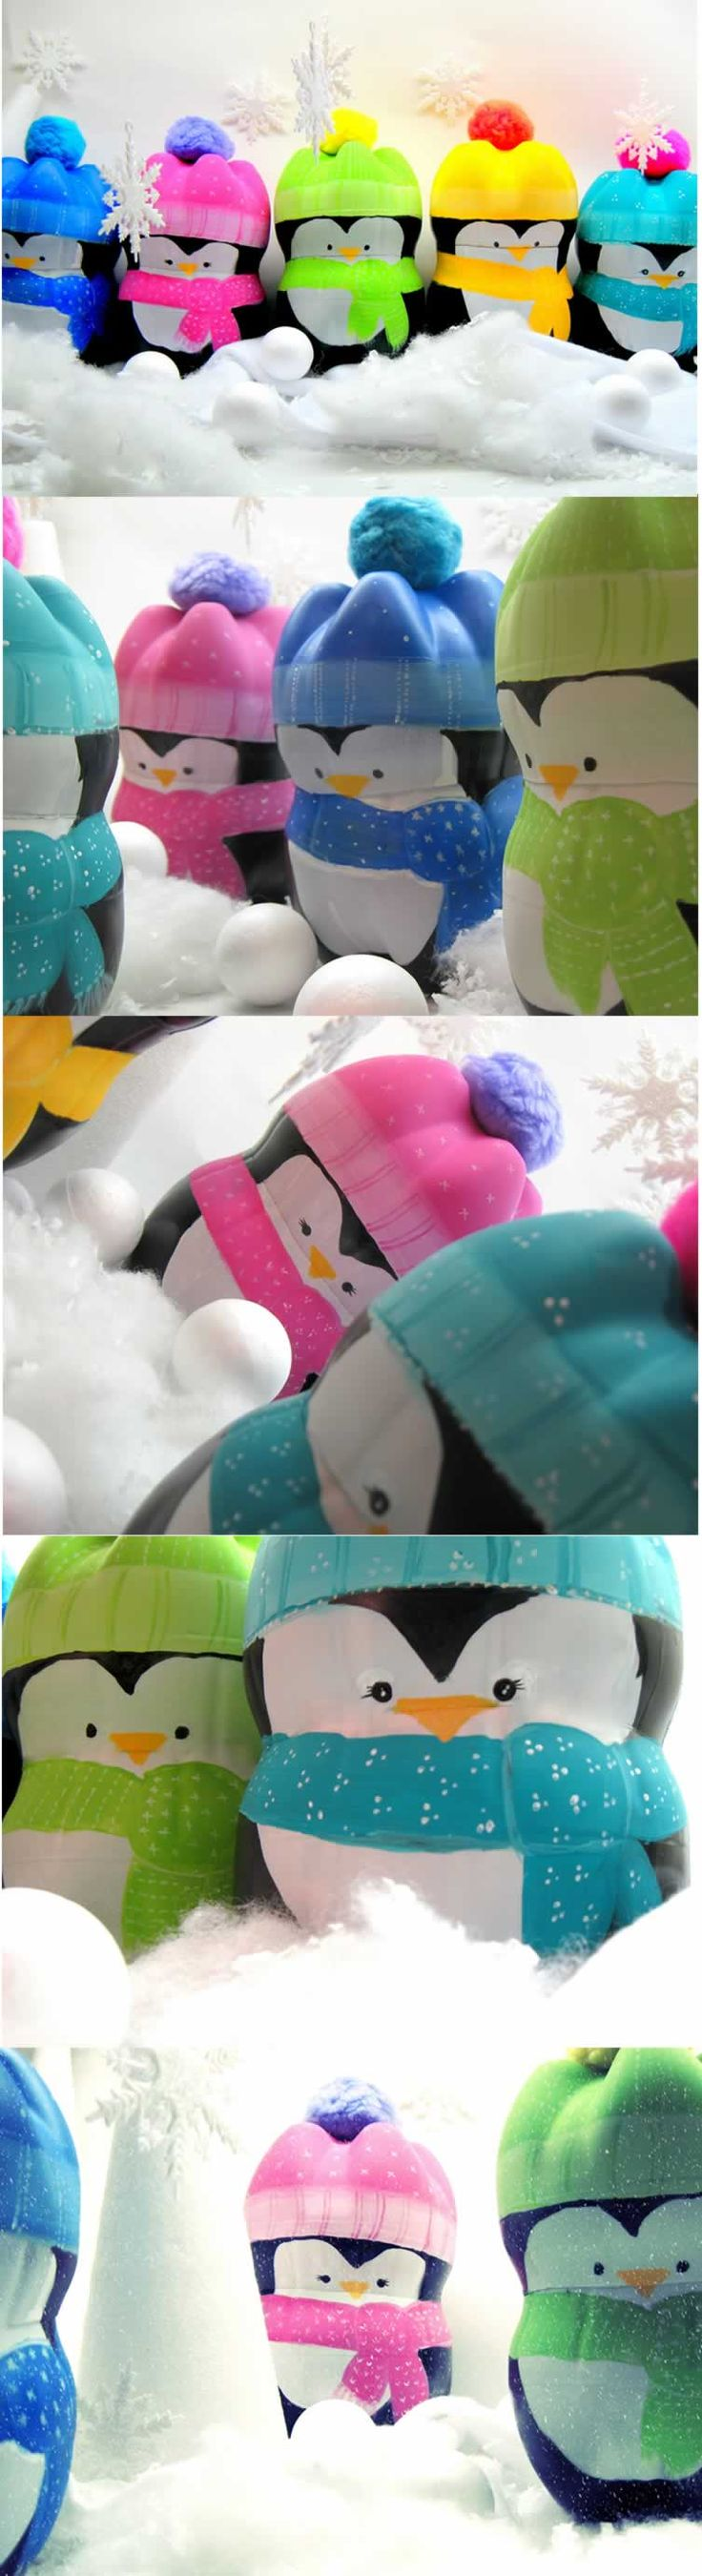 Pinguins de garrafa PET.